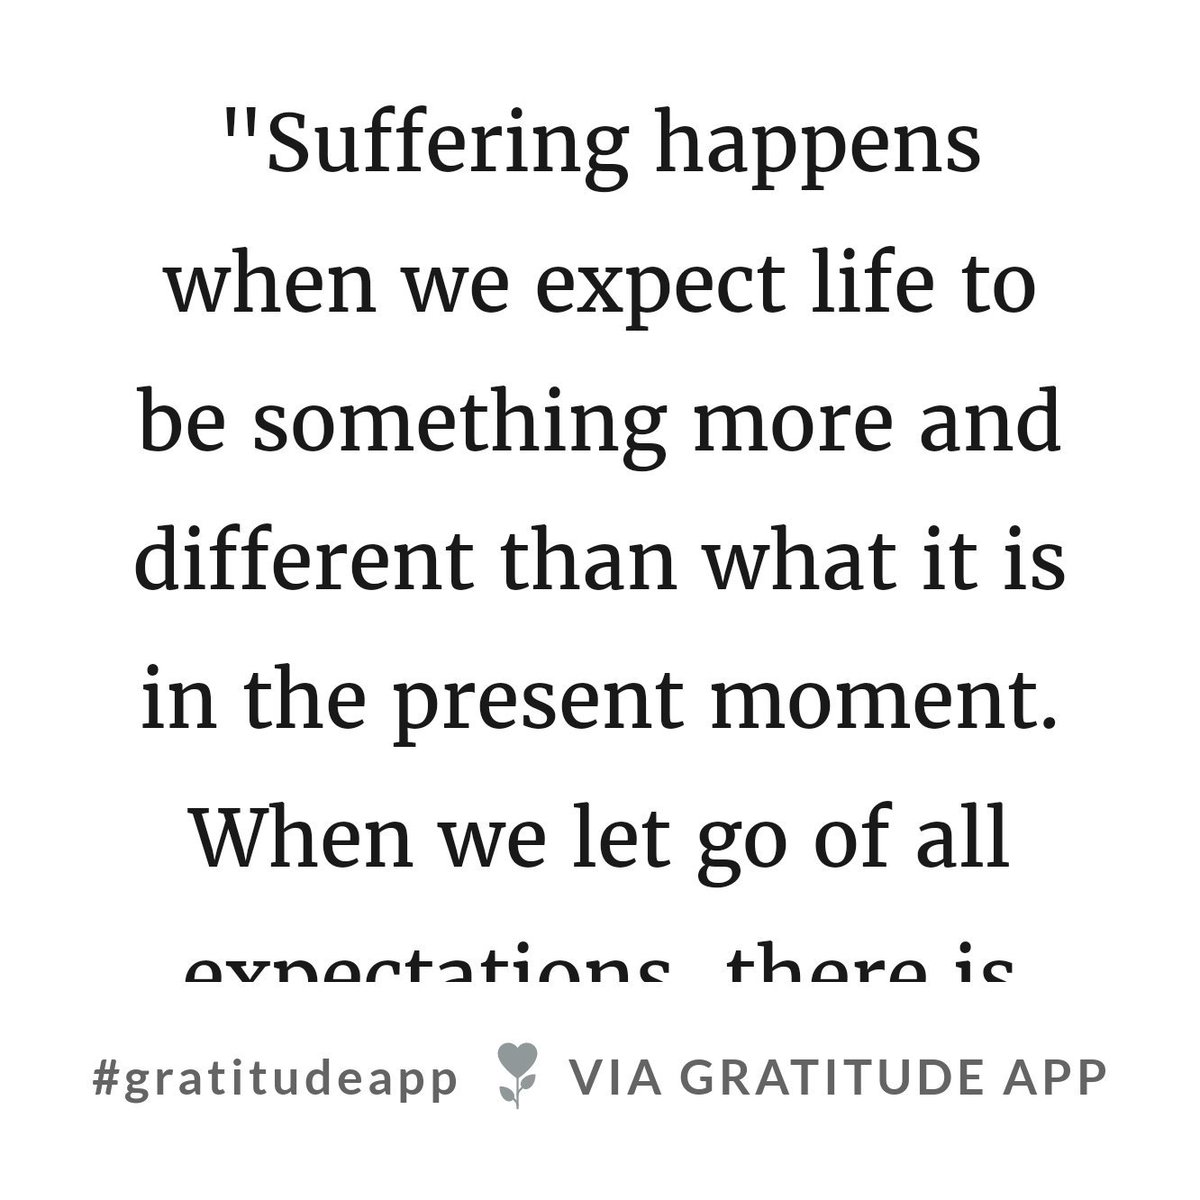 #gratitudeattitude  Shared via  https:// gratefulness.page.link/_    <br>http://pic.twitter.com/m5cKoHKnn1